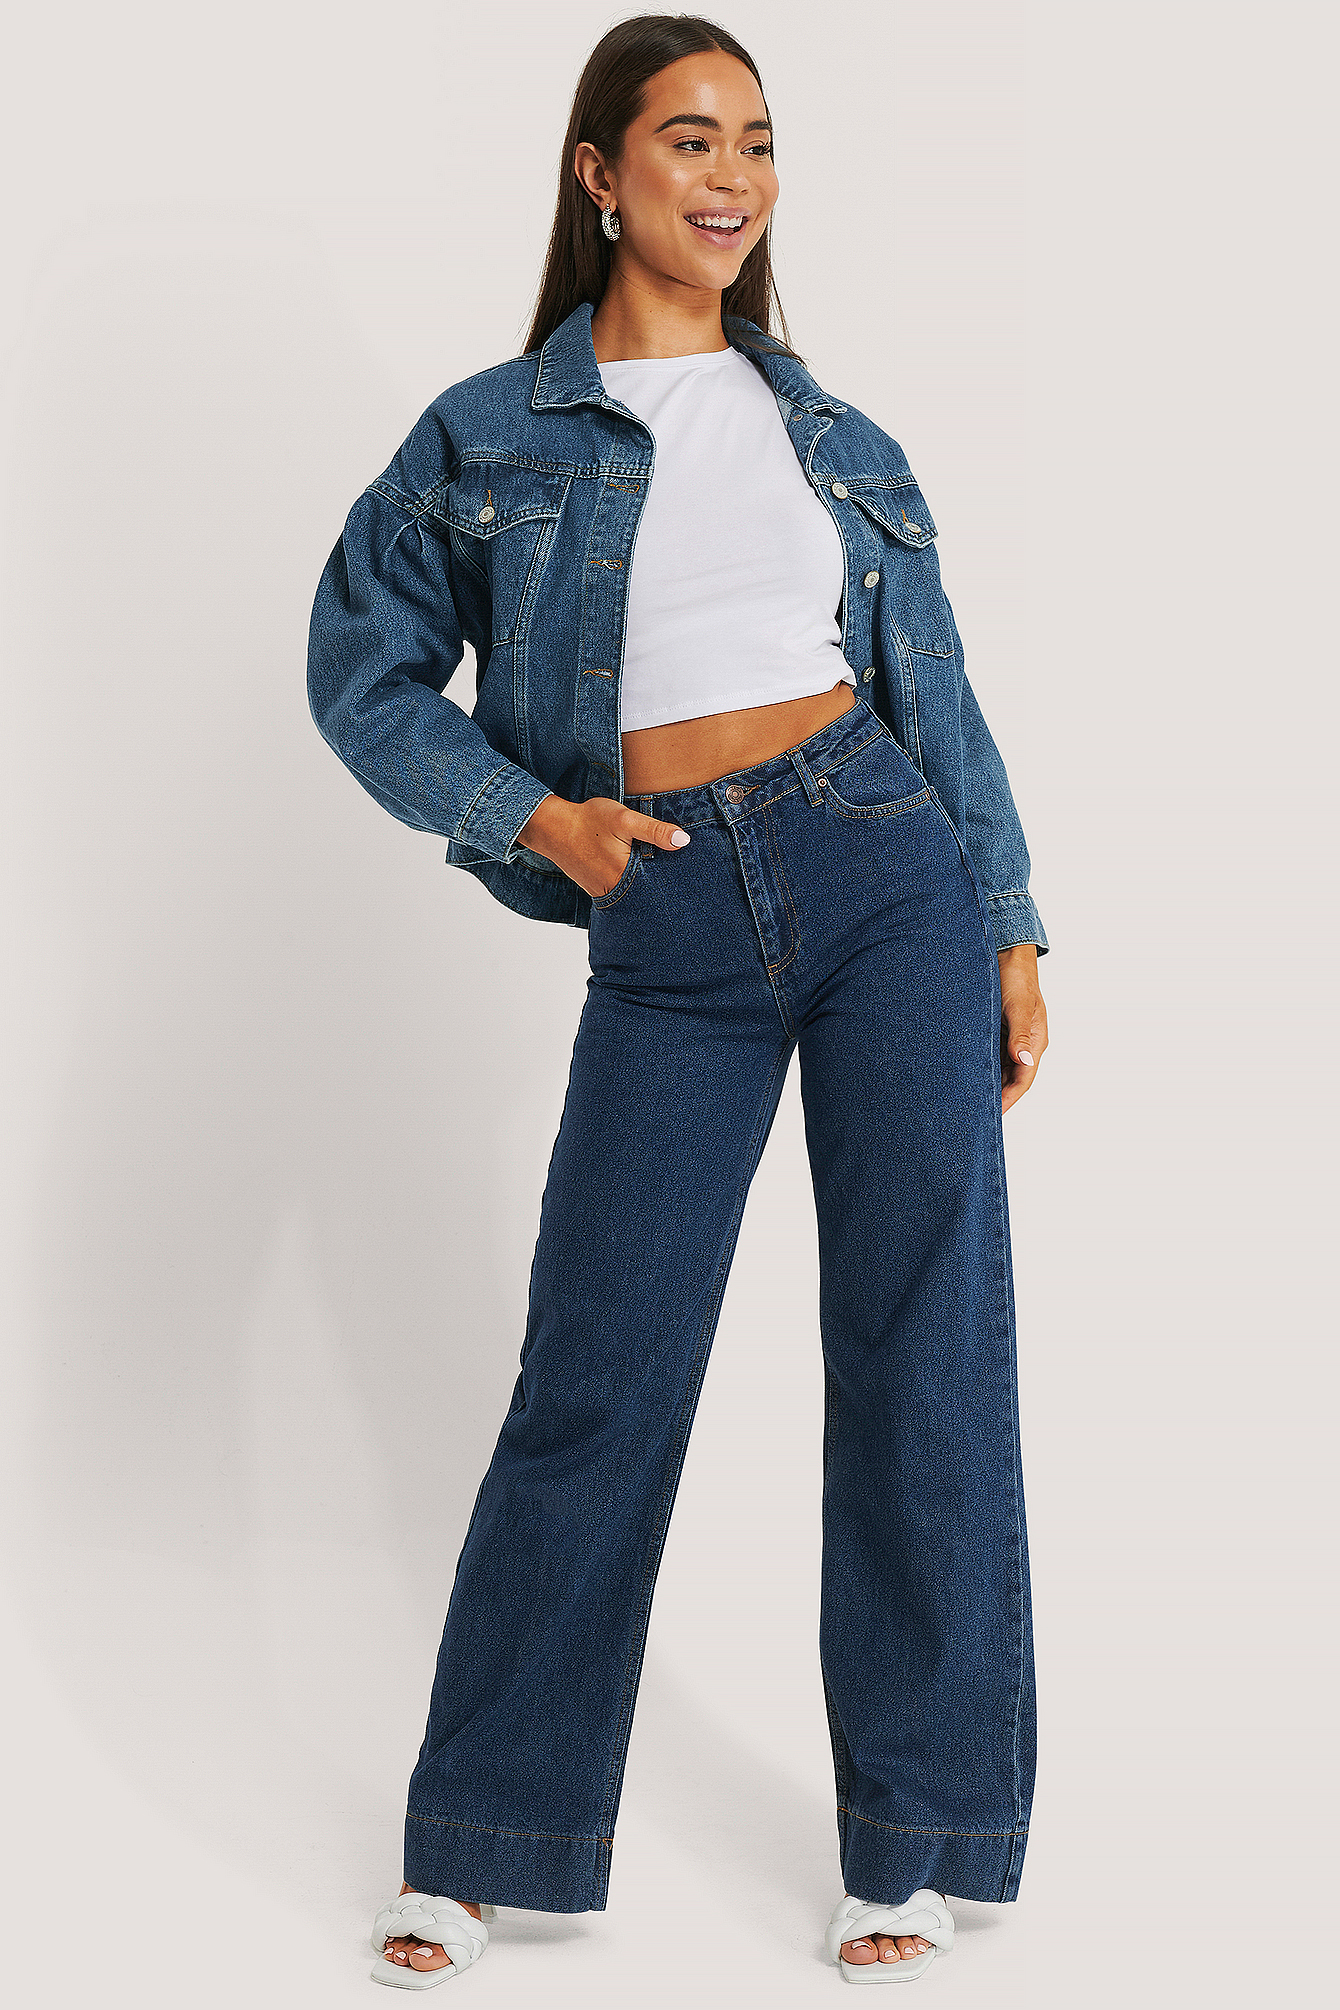 trendyol -  Hohe Taille Weites Bein Jeans - Blue